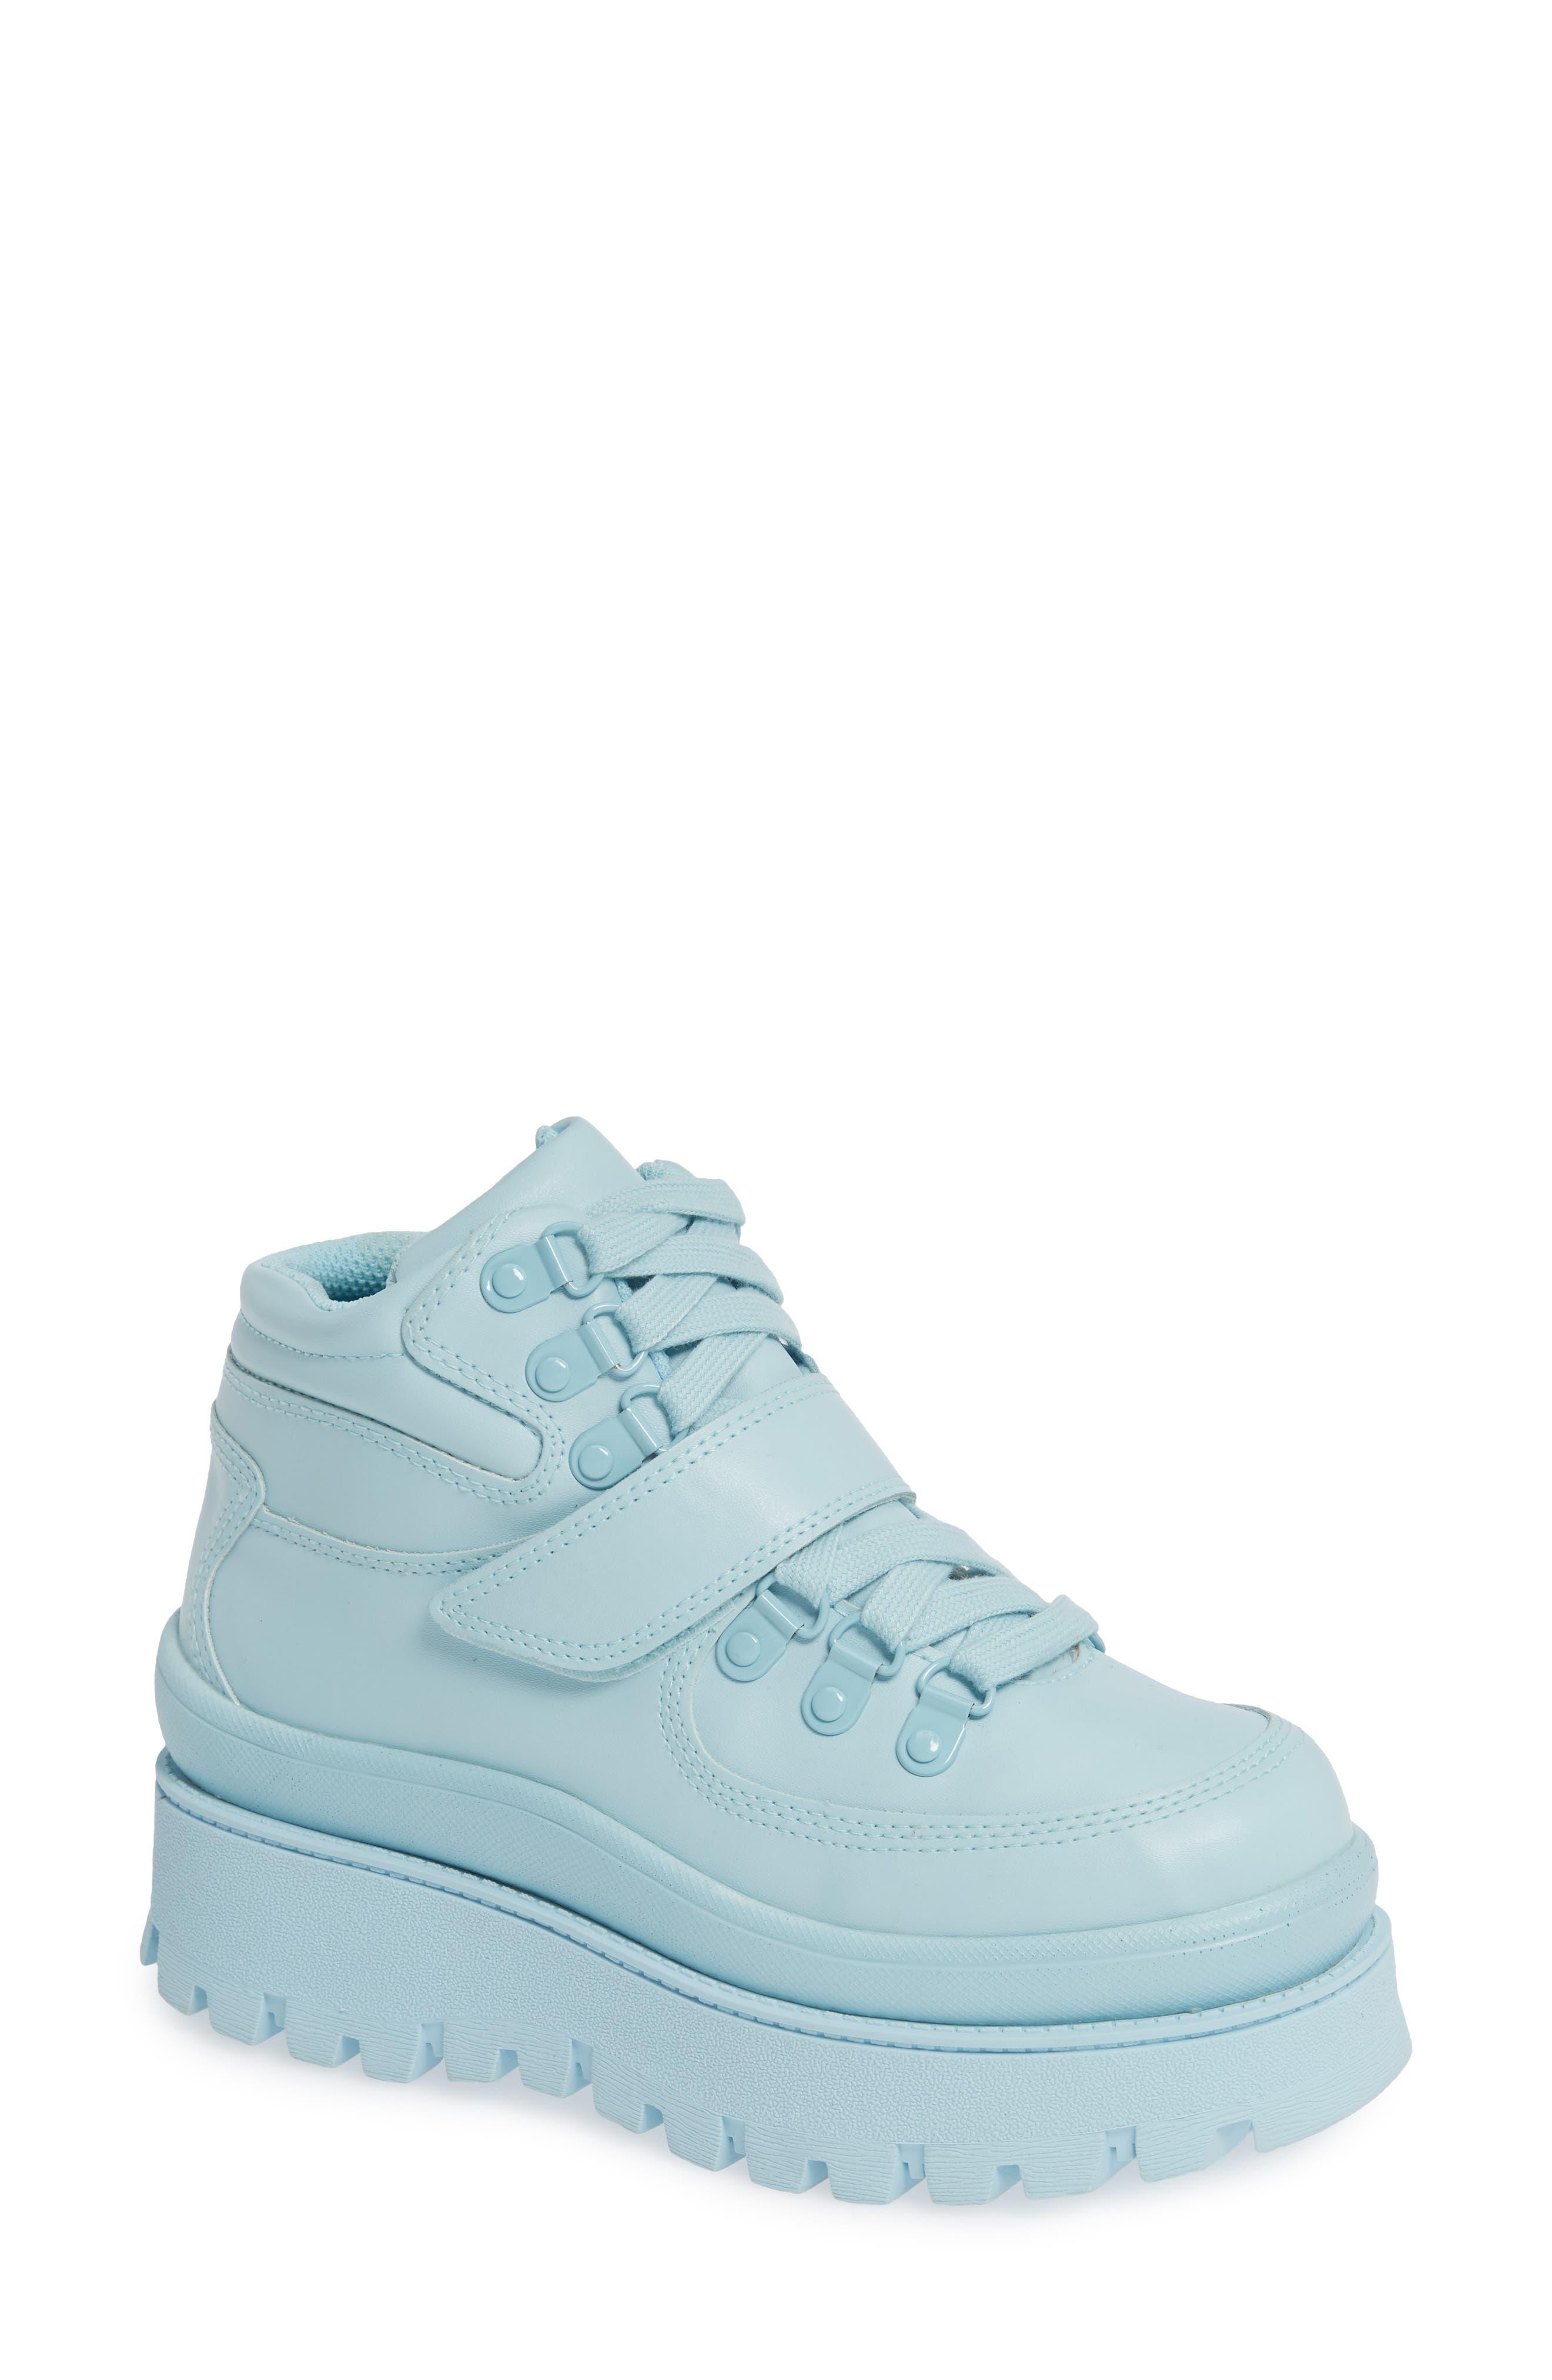 Jeffrey Campbell Top Peak 2 Platform Sneaker, Blue/green